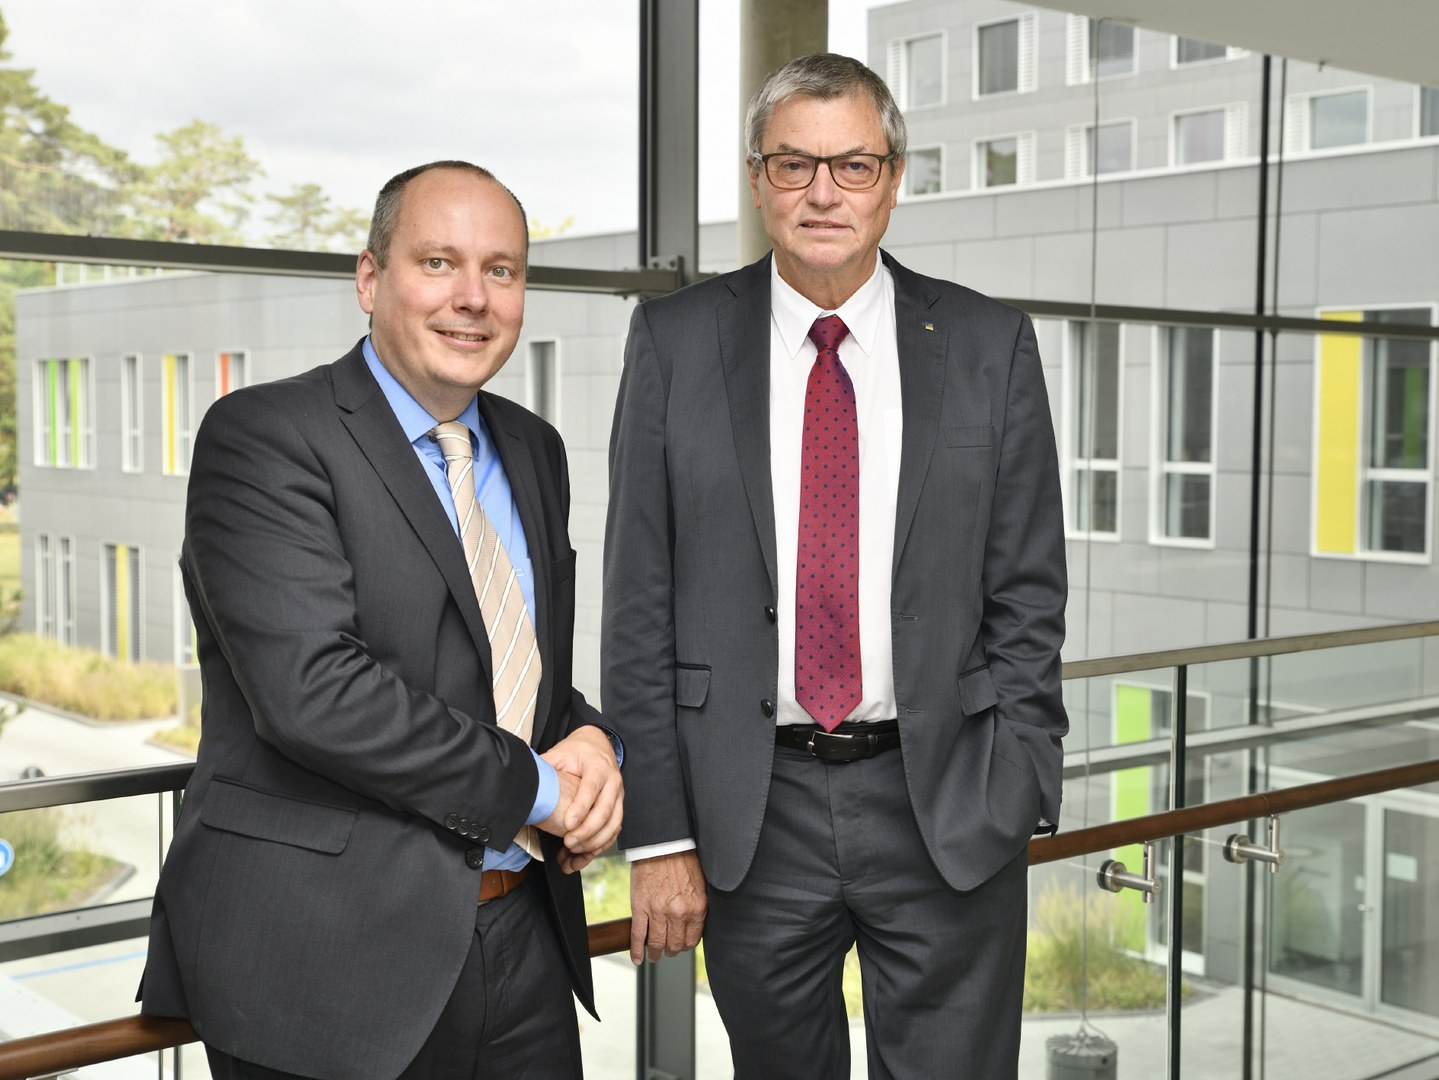 Neuer Dekan der Medizinischen Fakultät der Universität Bonn: